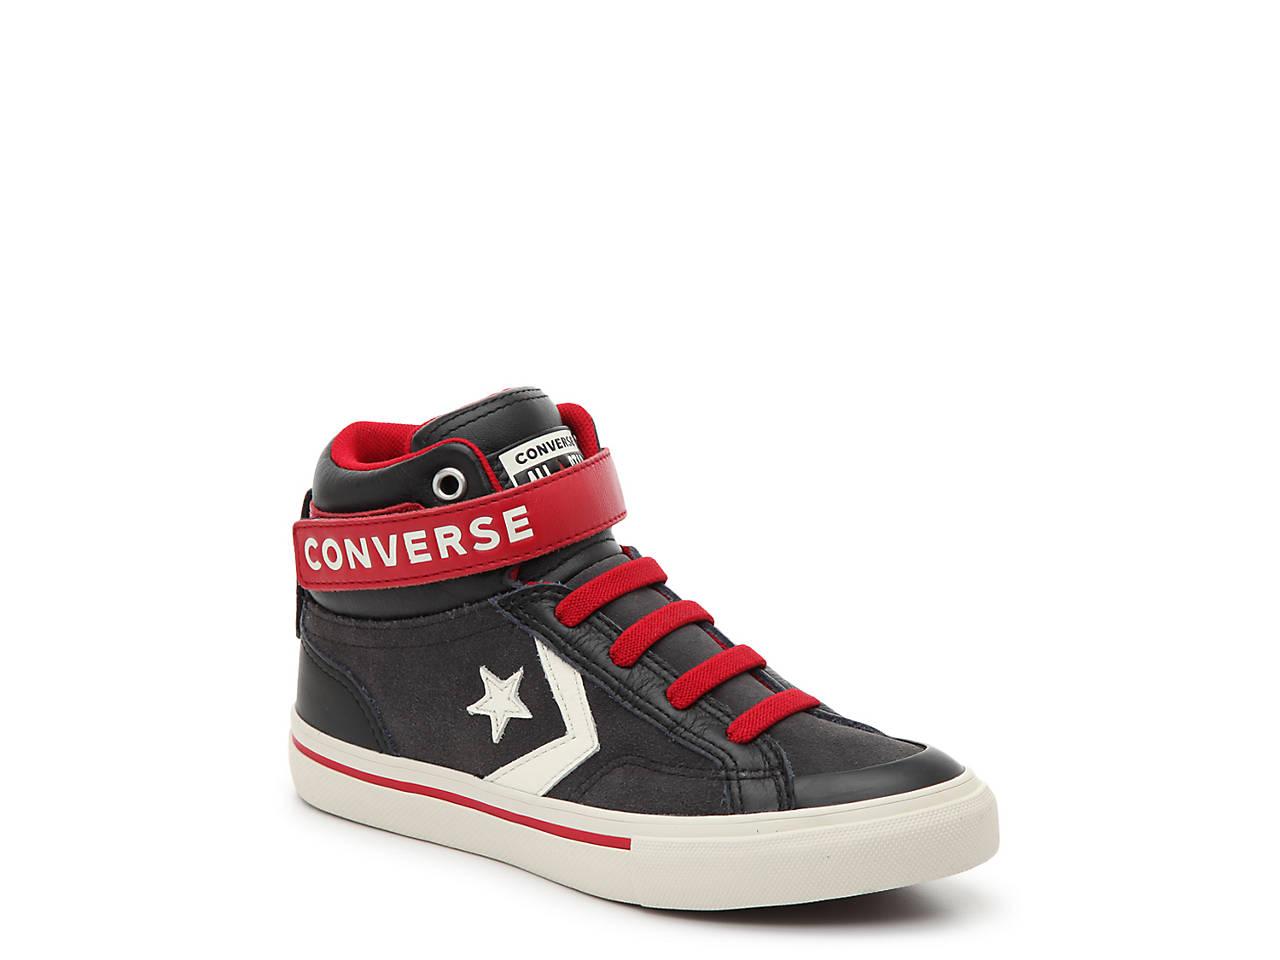 f0056ba9a866 Converse Pro Blaze Strap Hi Toddler   Youth High-Top Sneaker Kids ...